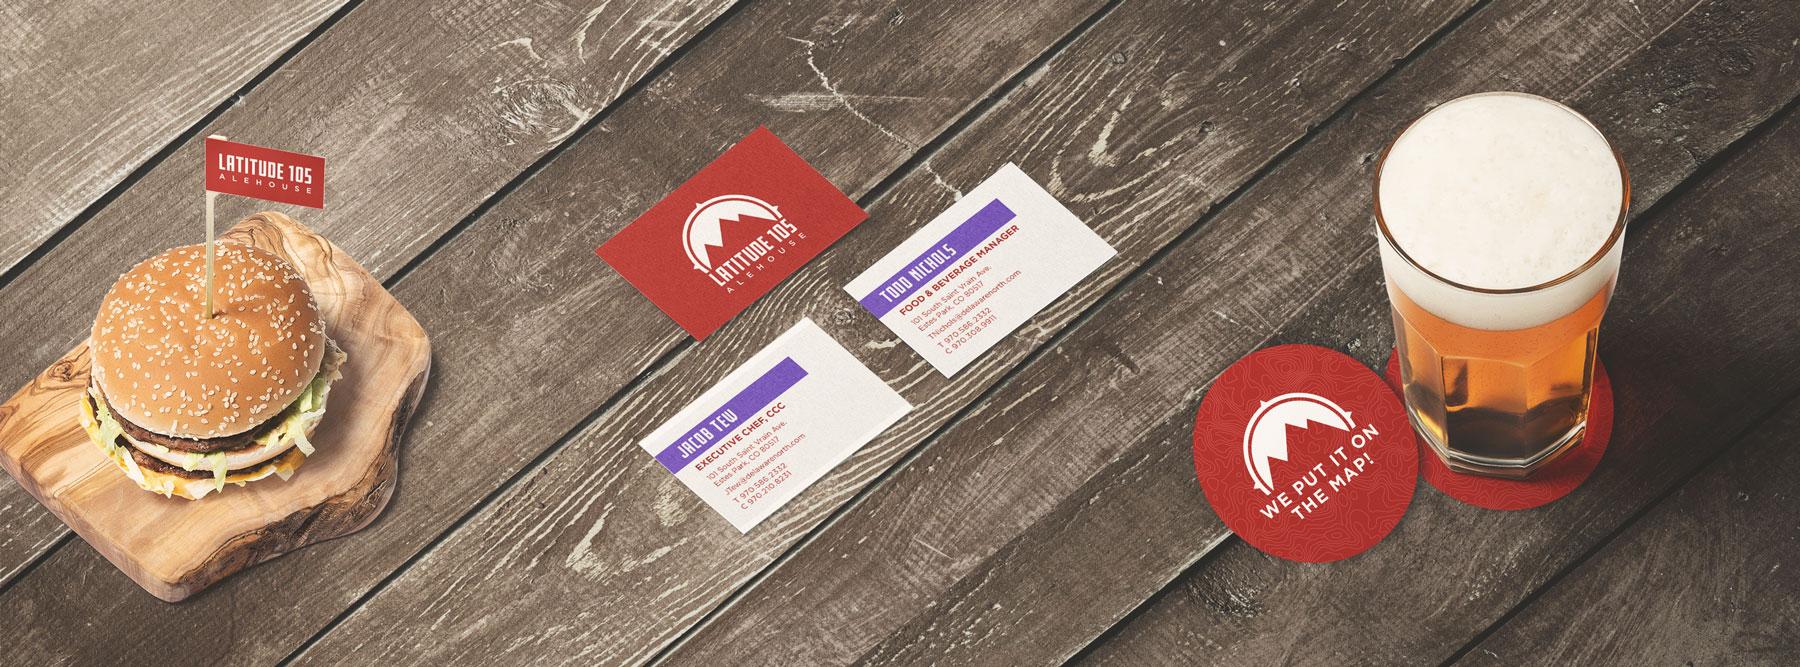 latitude-105-business-cards